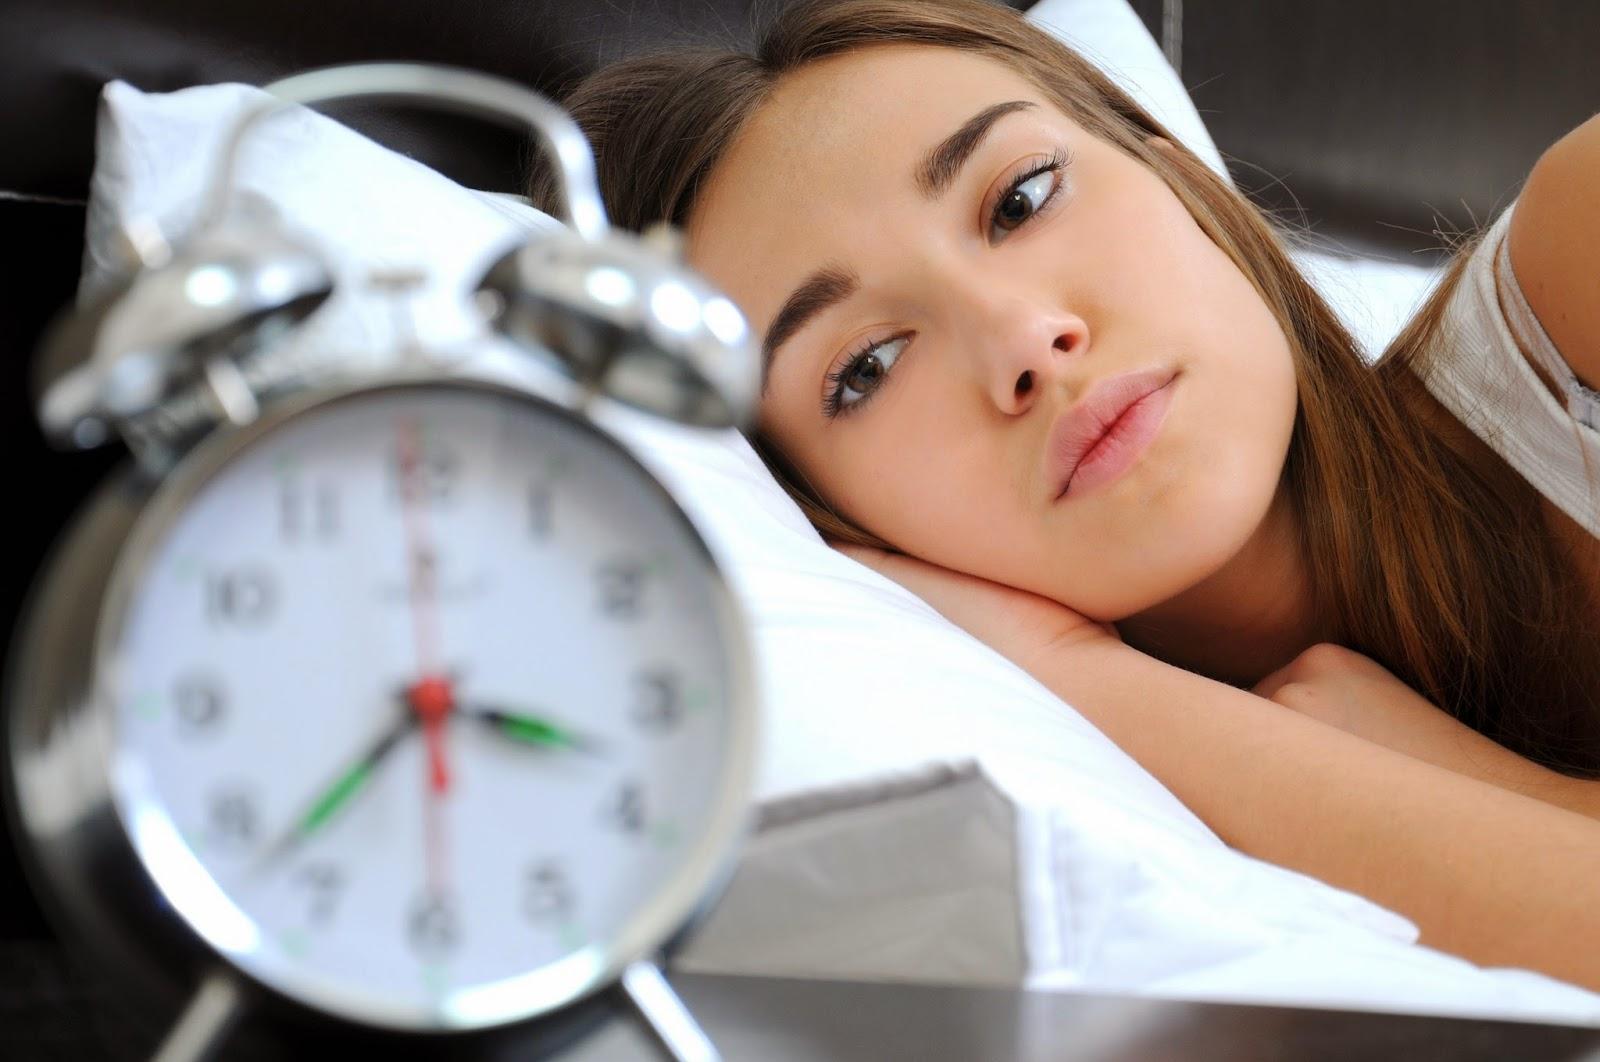 Durasi Tidur Berdasarkan Usia